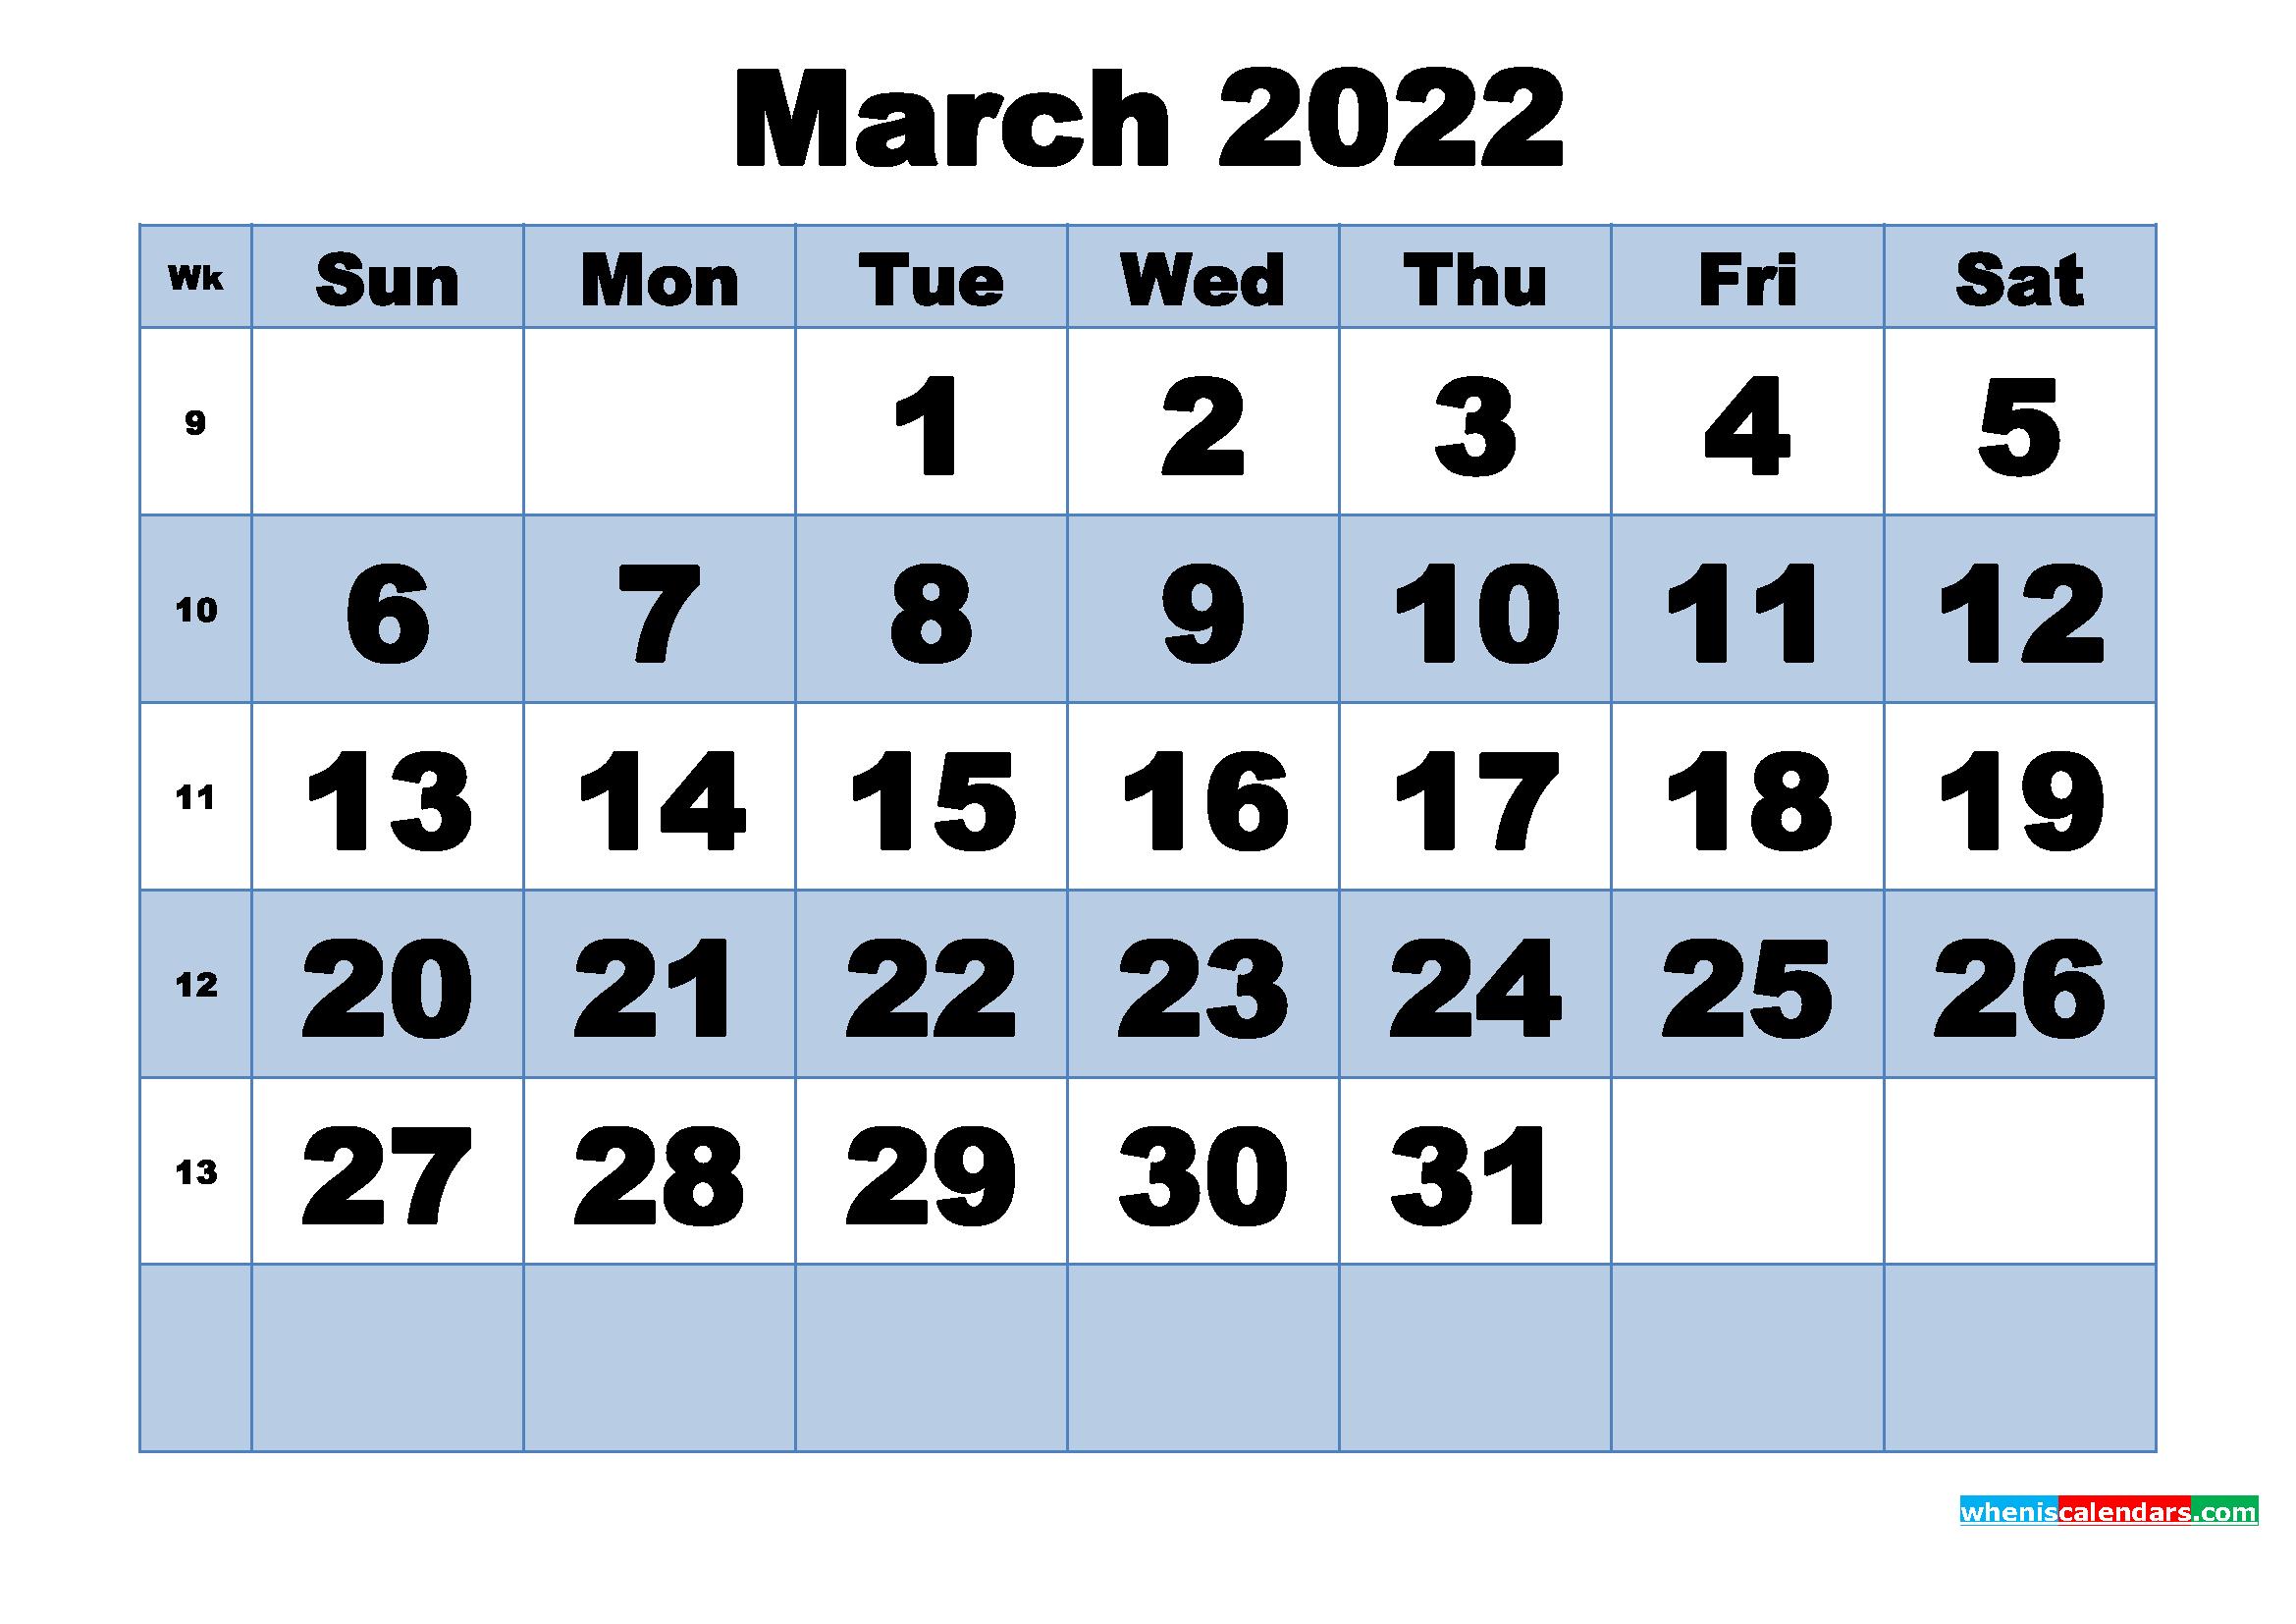 Free Printable March 2022 Calendar with Week Numbers